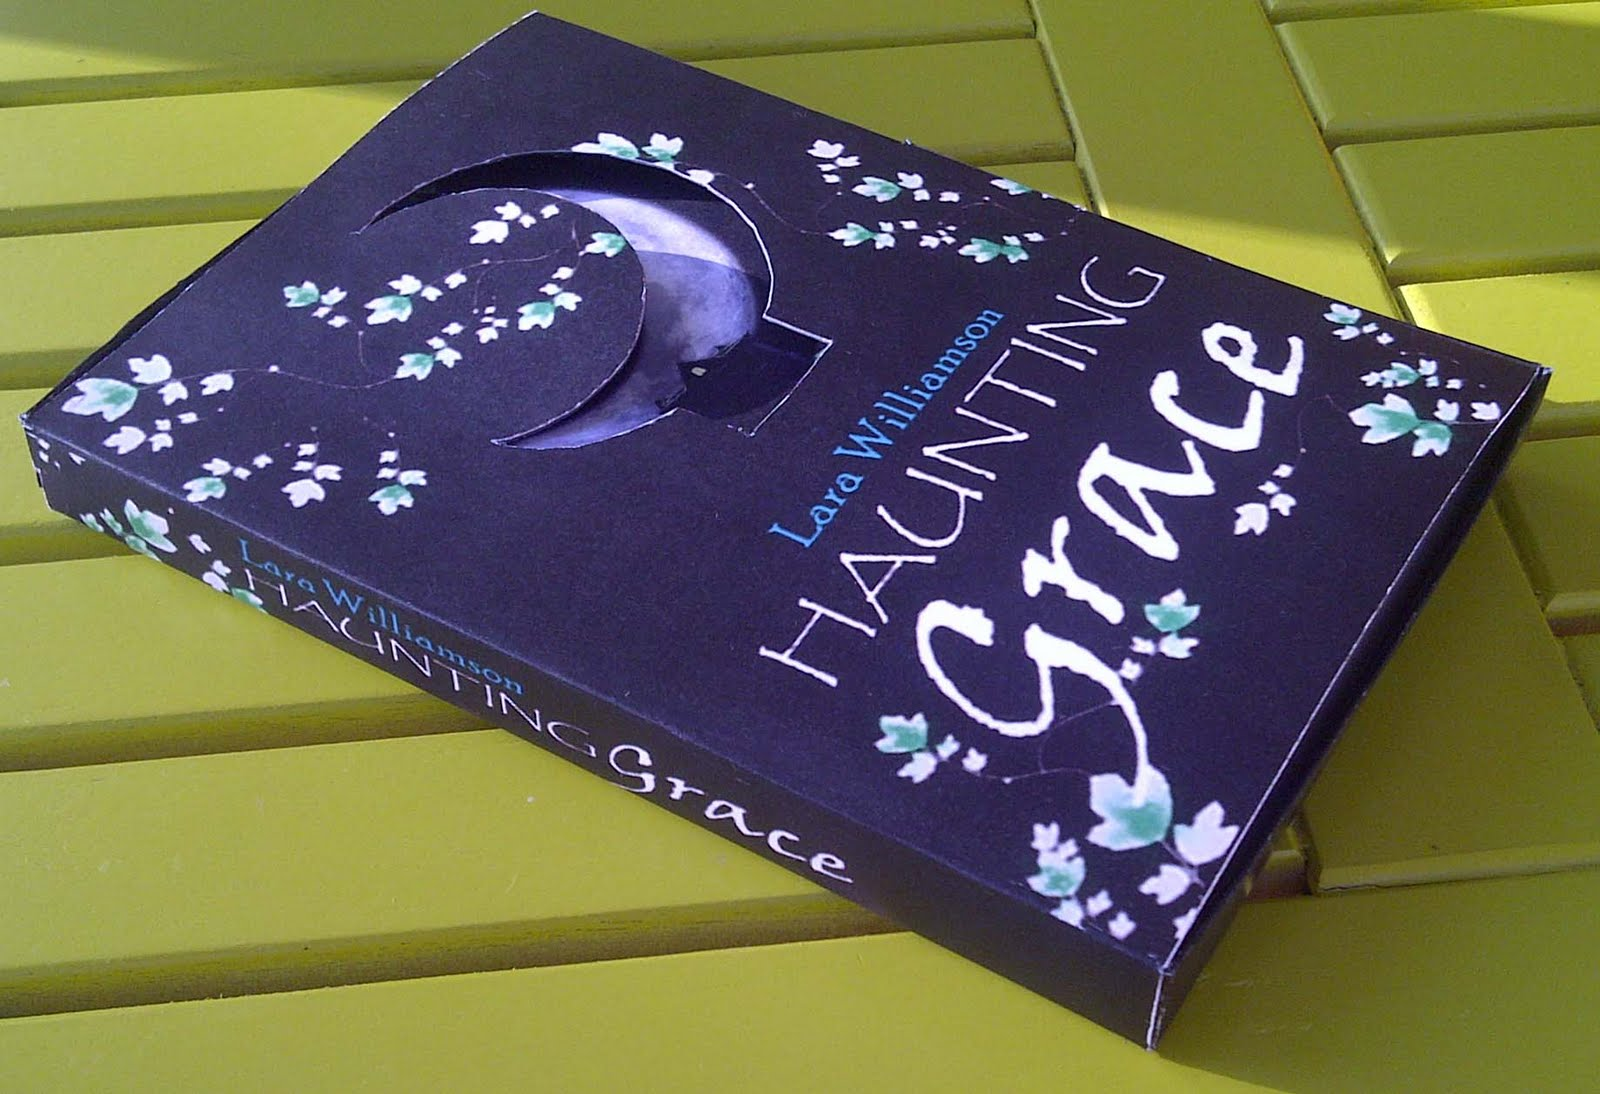 Beautiful Book Cover Design Handmade : Handmade book cover designs imgkid the image